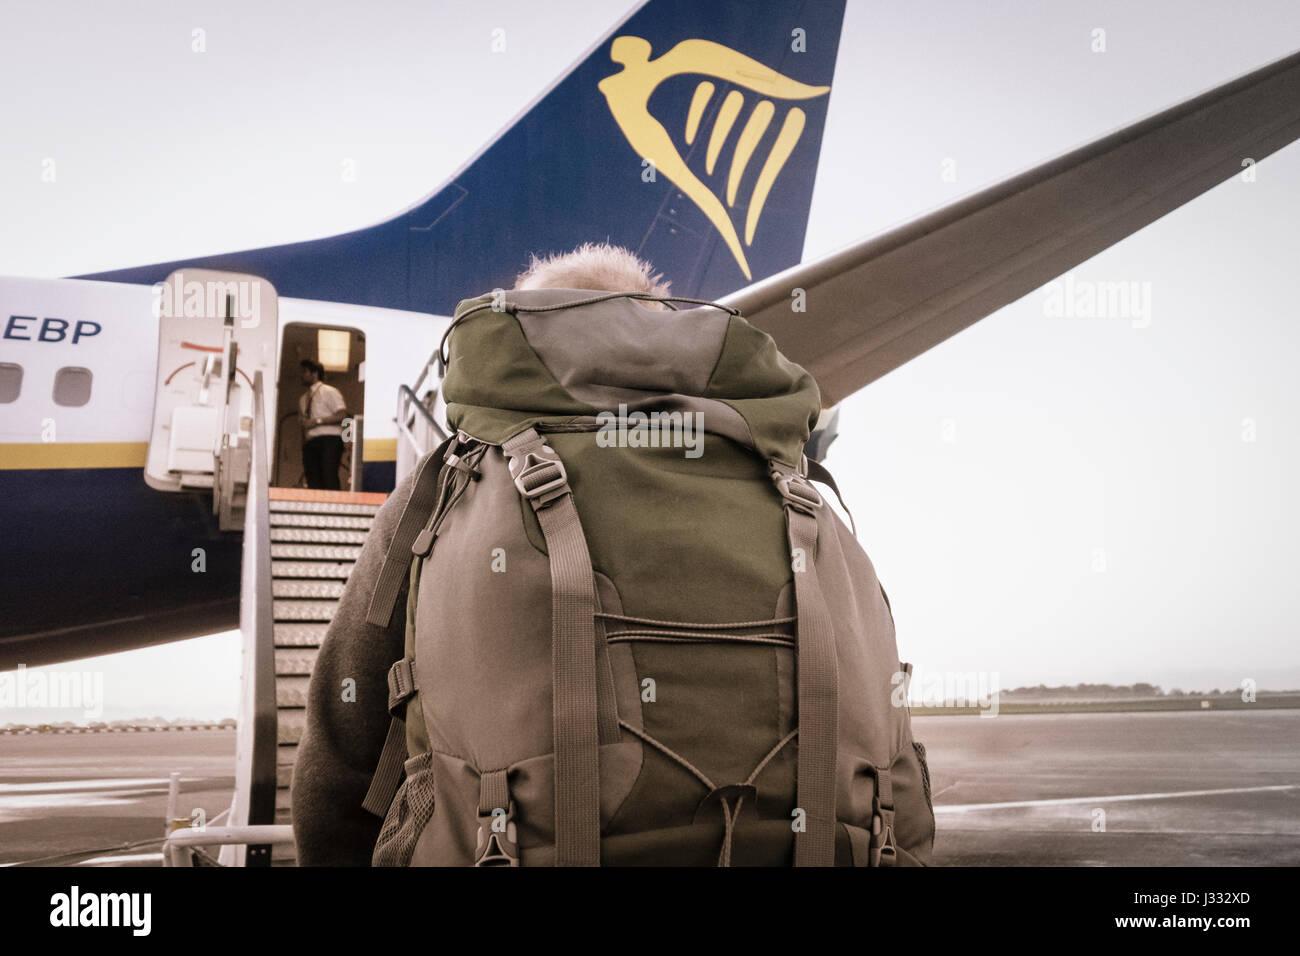 Backpacker boarding Ryanair flight. - Stock Image